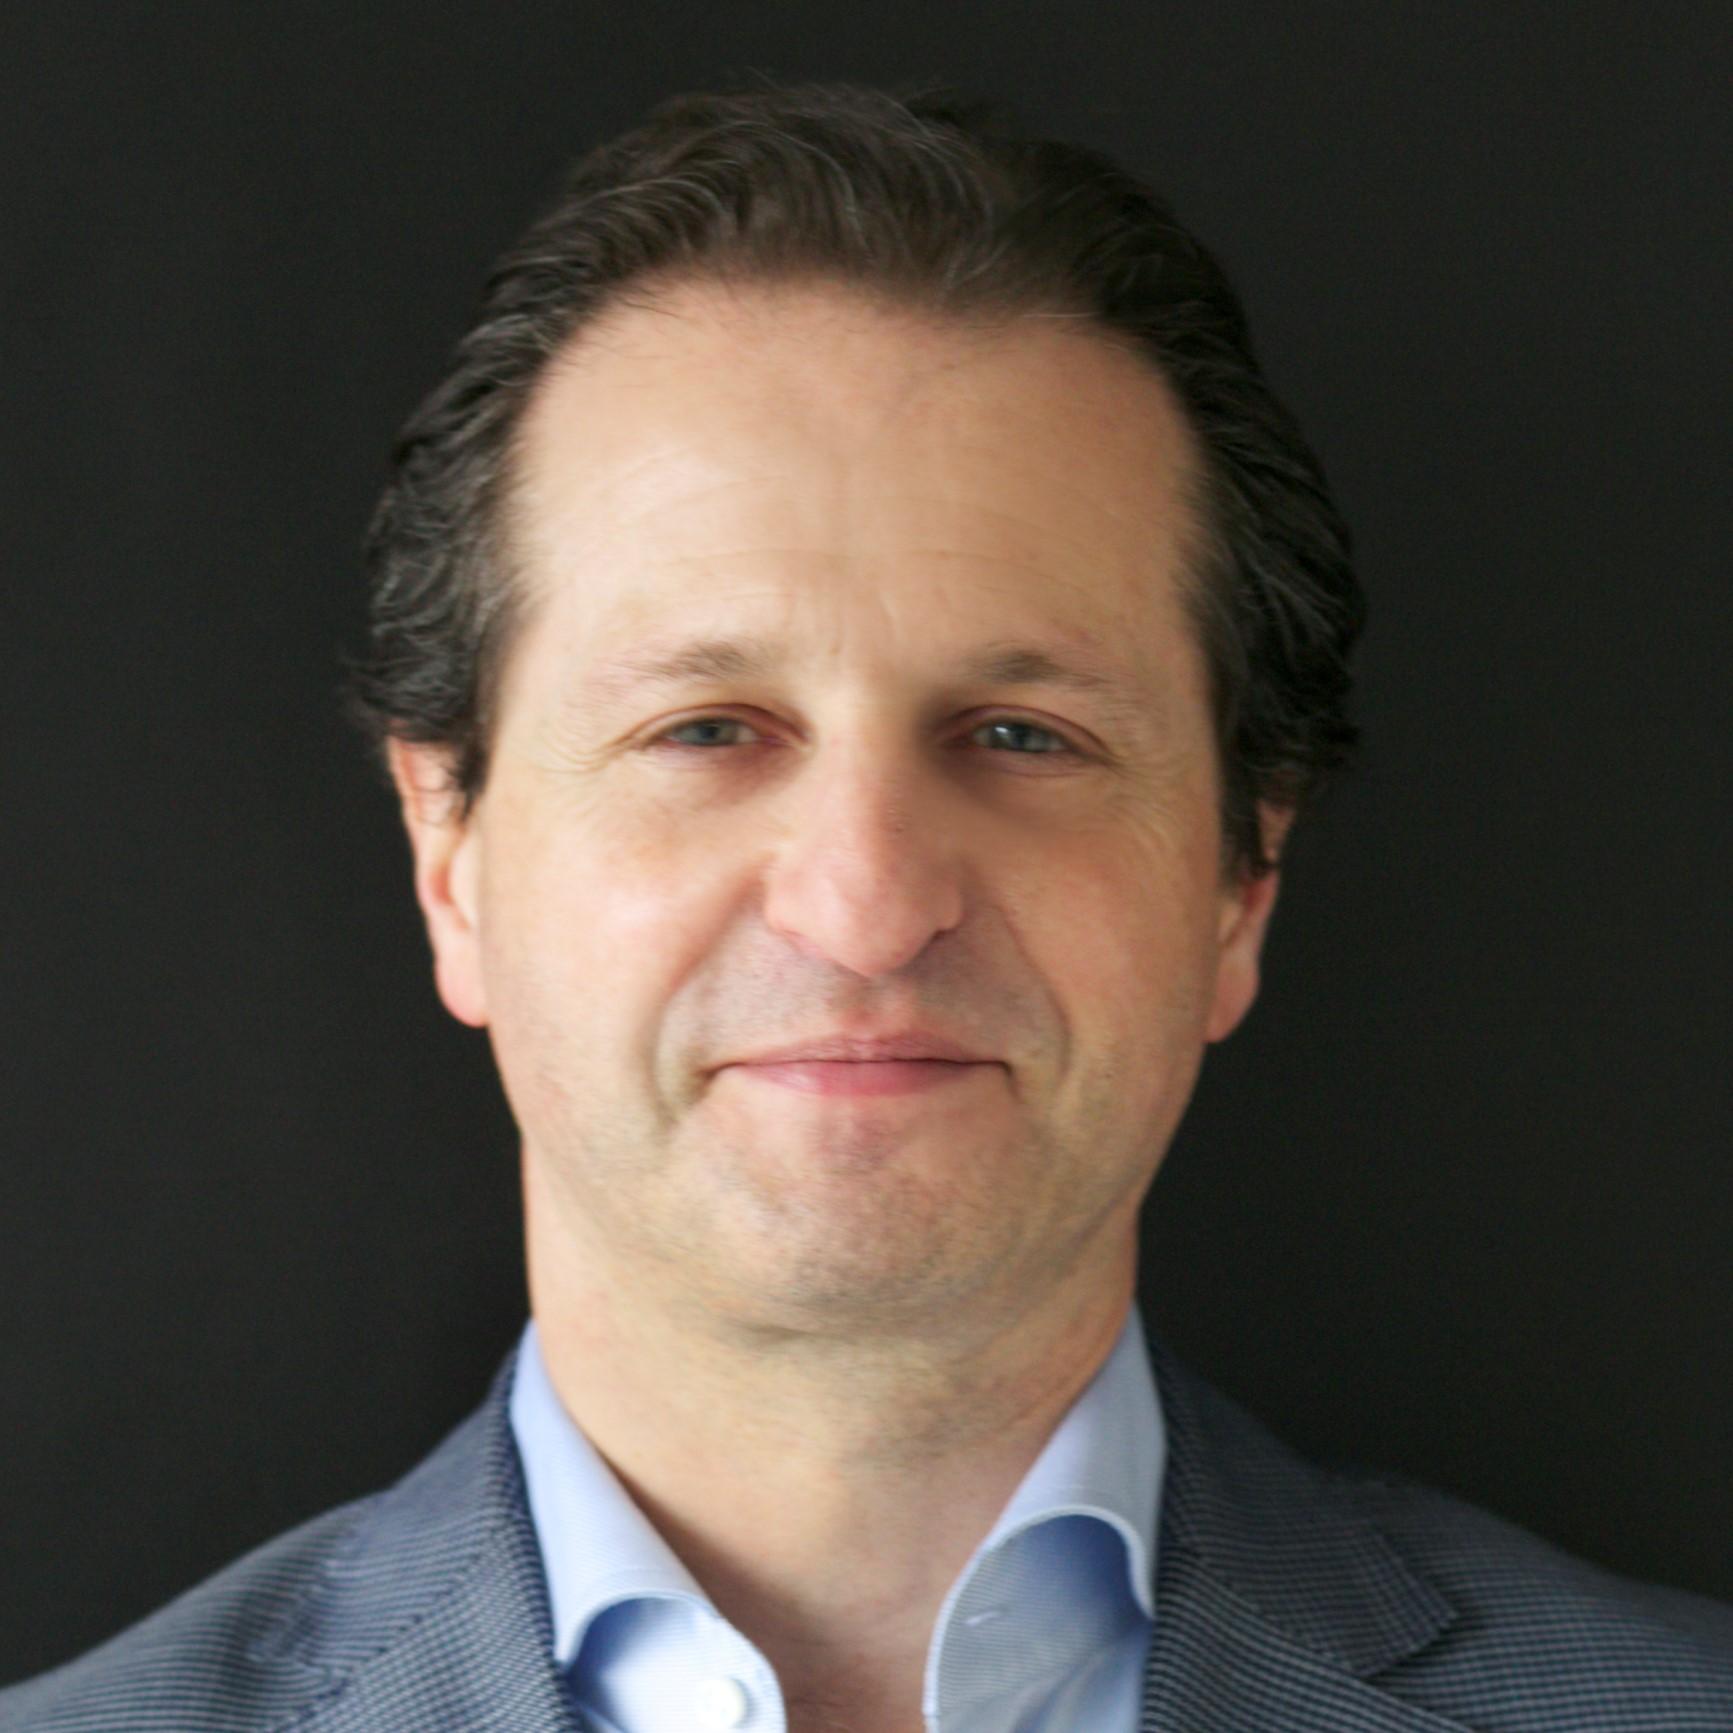 Peter Durlach